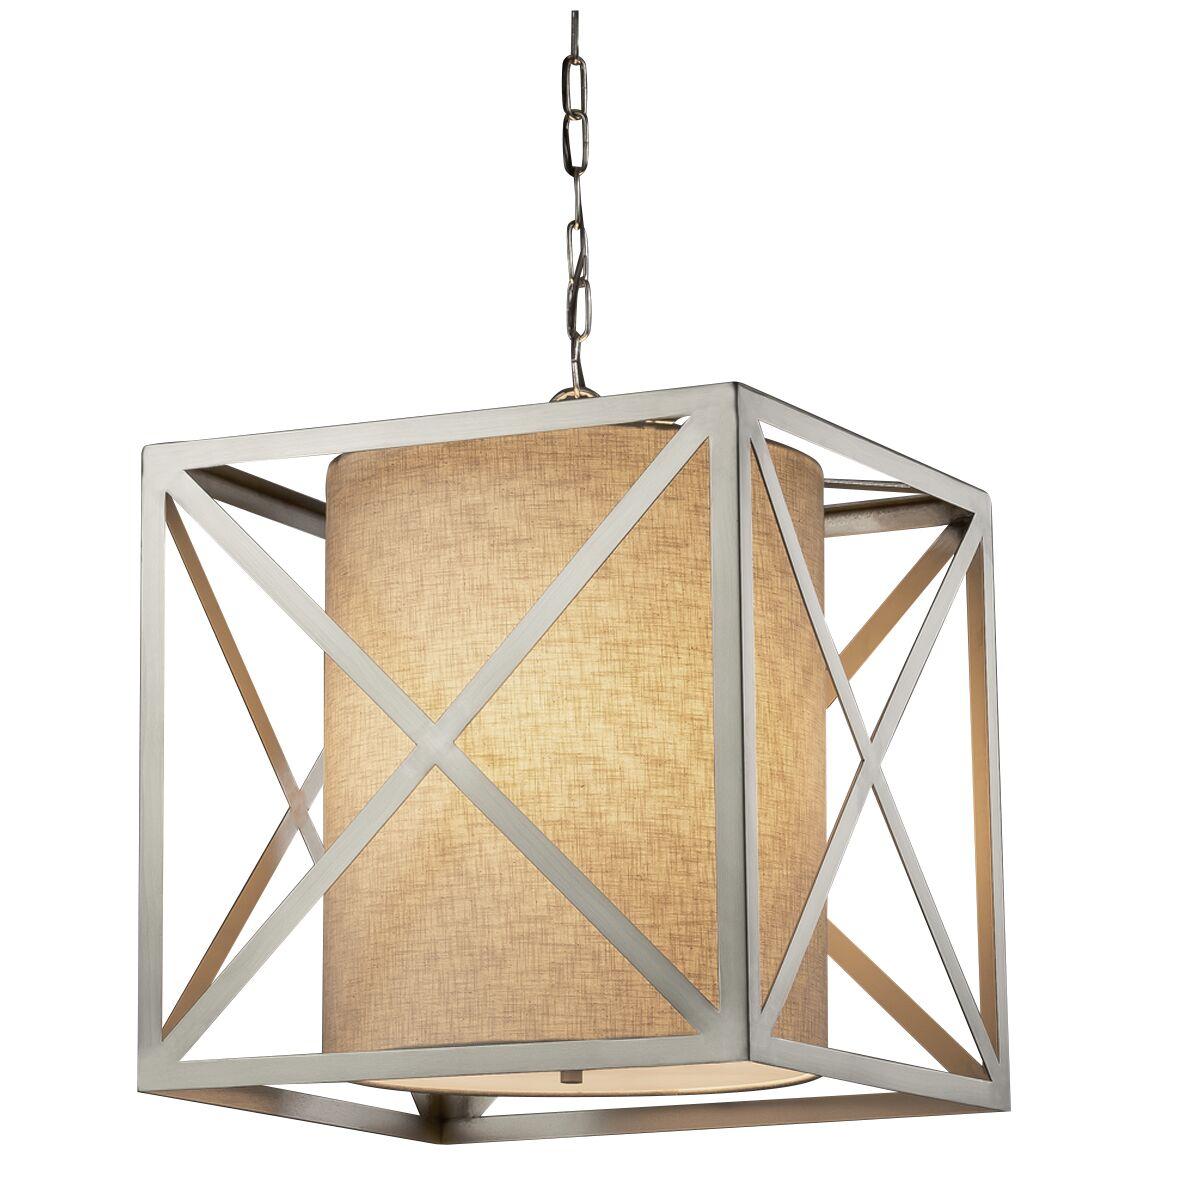 Kenyon 4-Light Square/Rectangle Chandelier Shade Color: Cream, Base Finish: Brushed Nickel